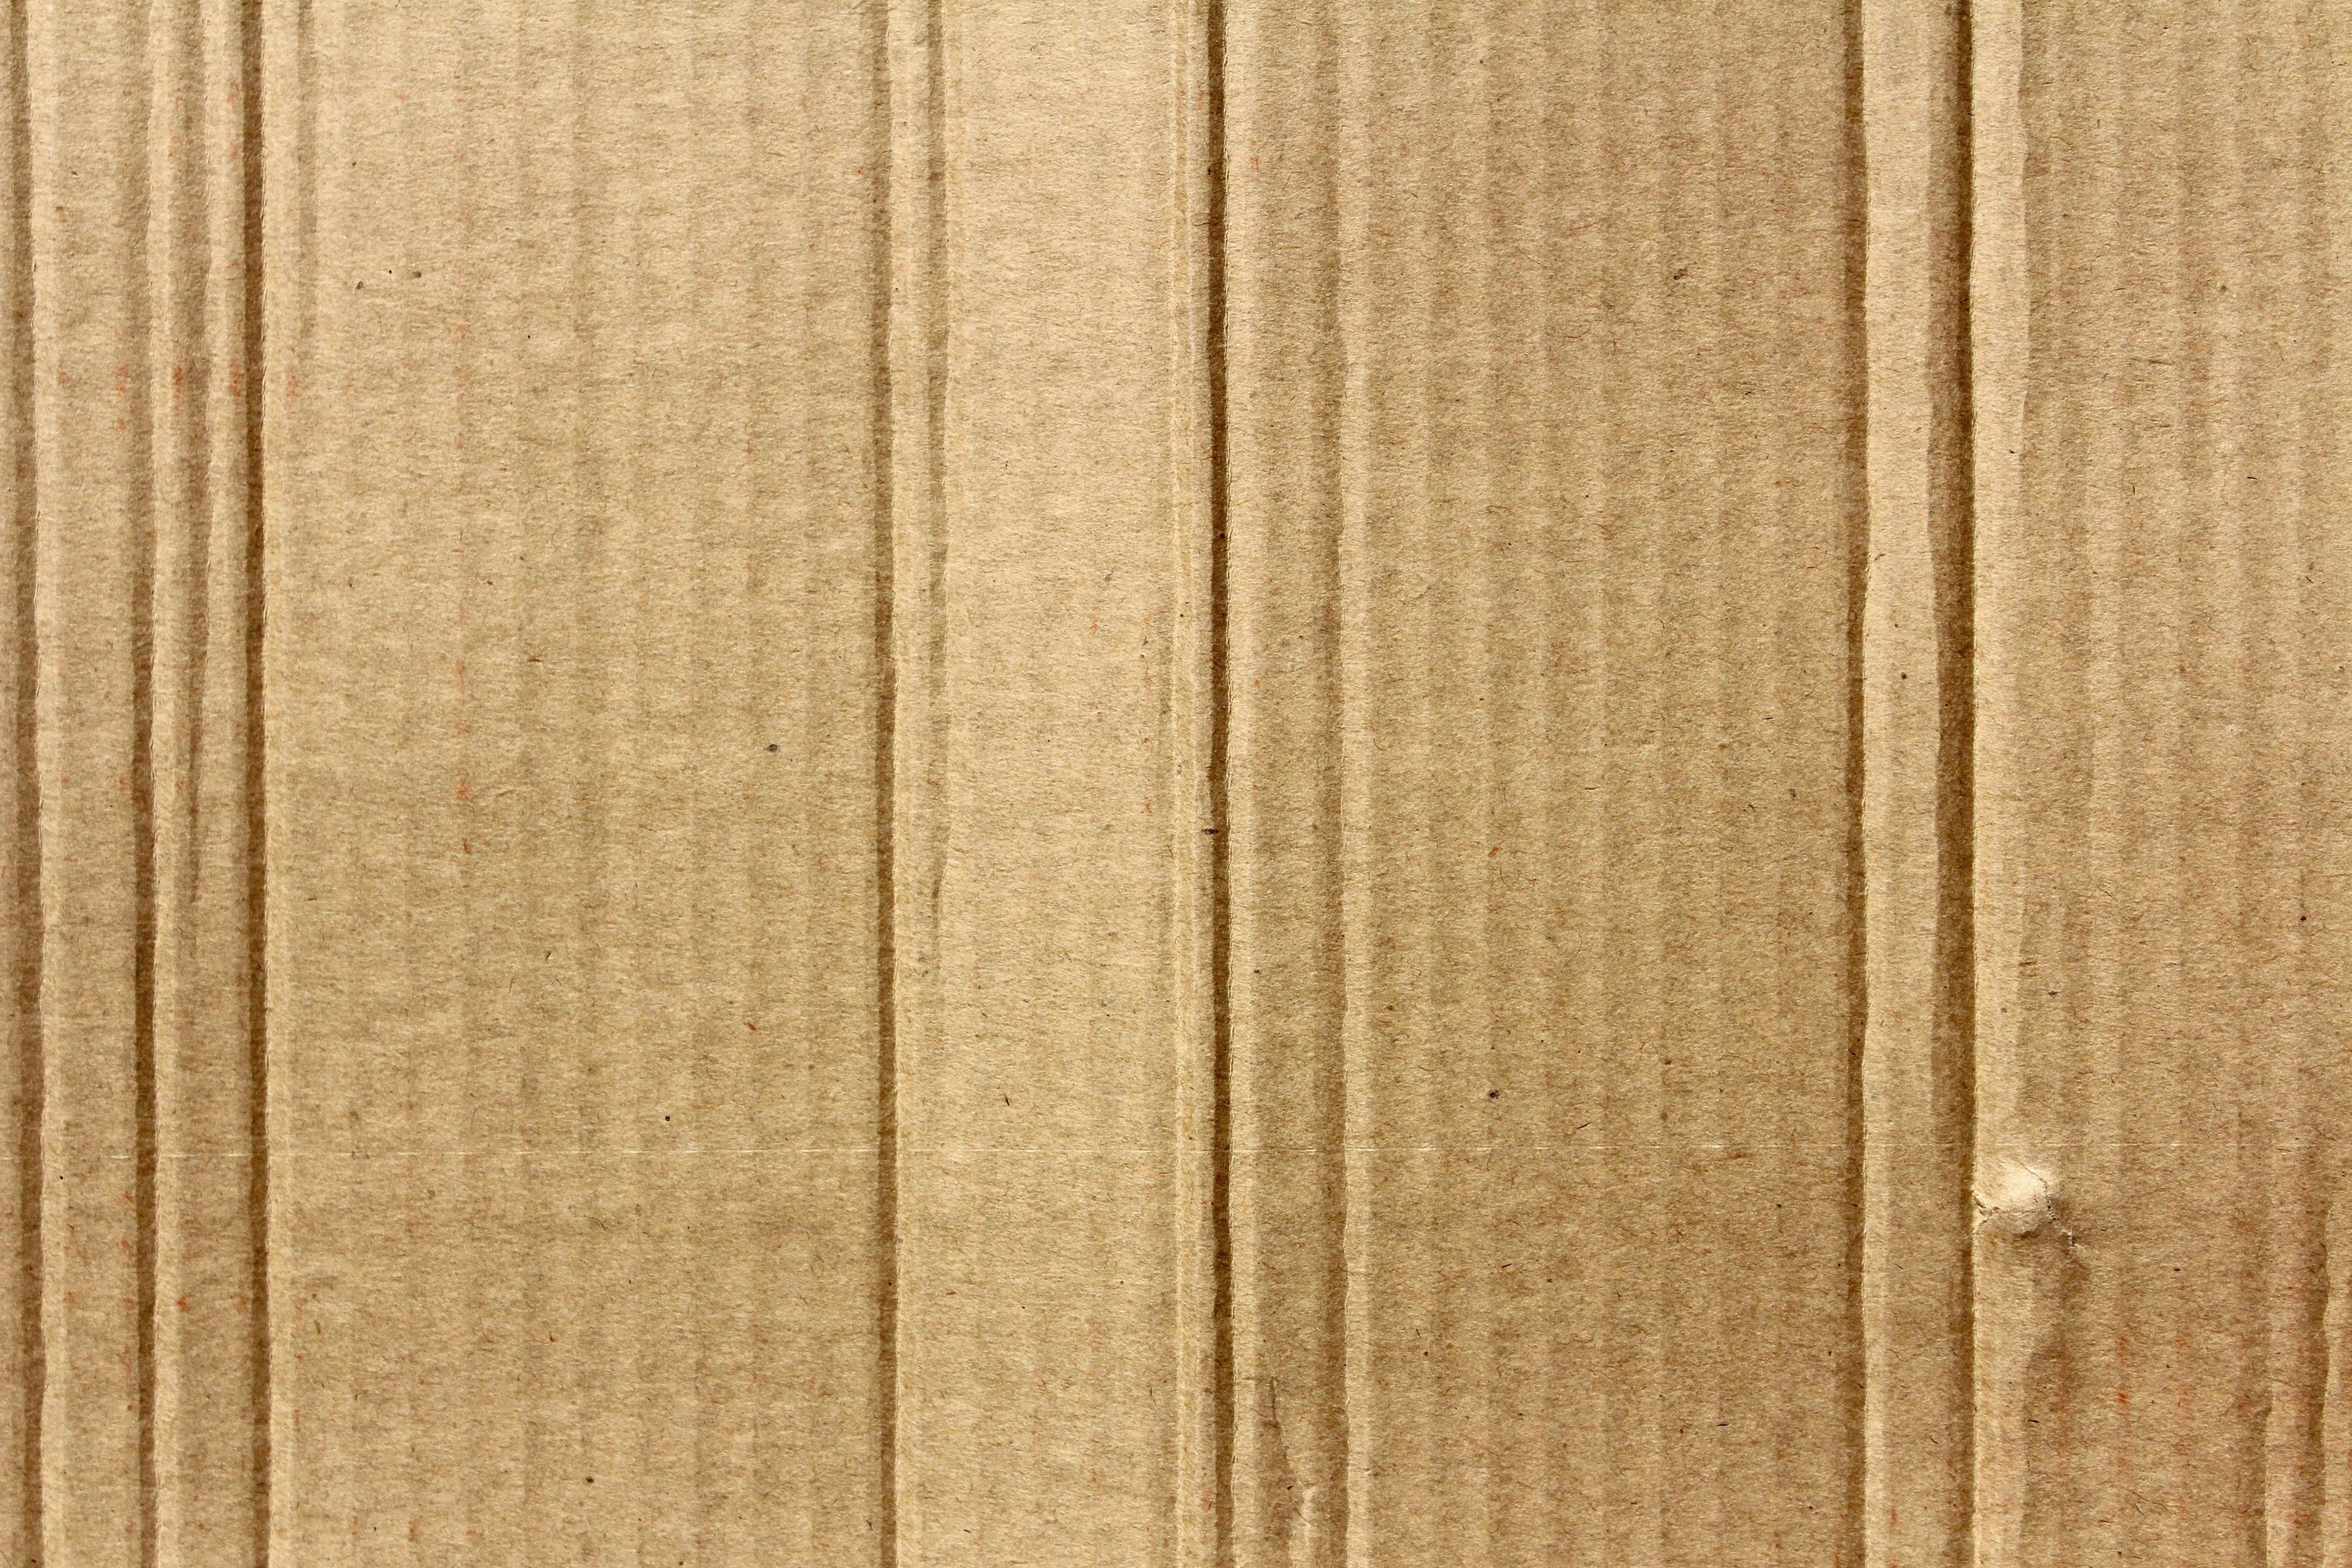 brown-cardboard-close-up-corrugated-479450